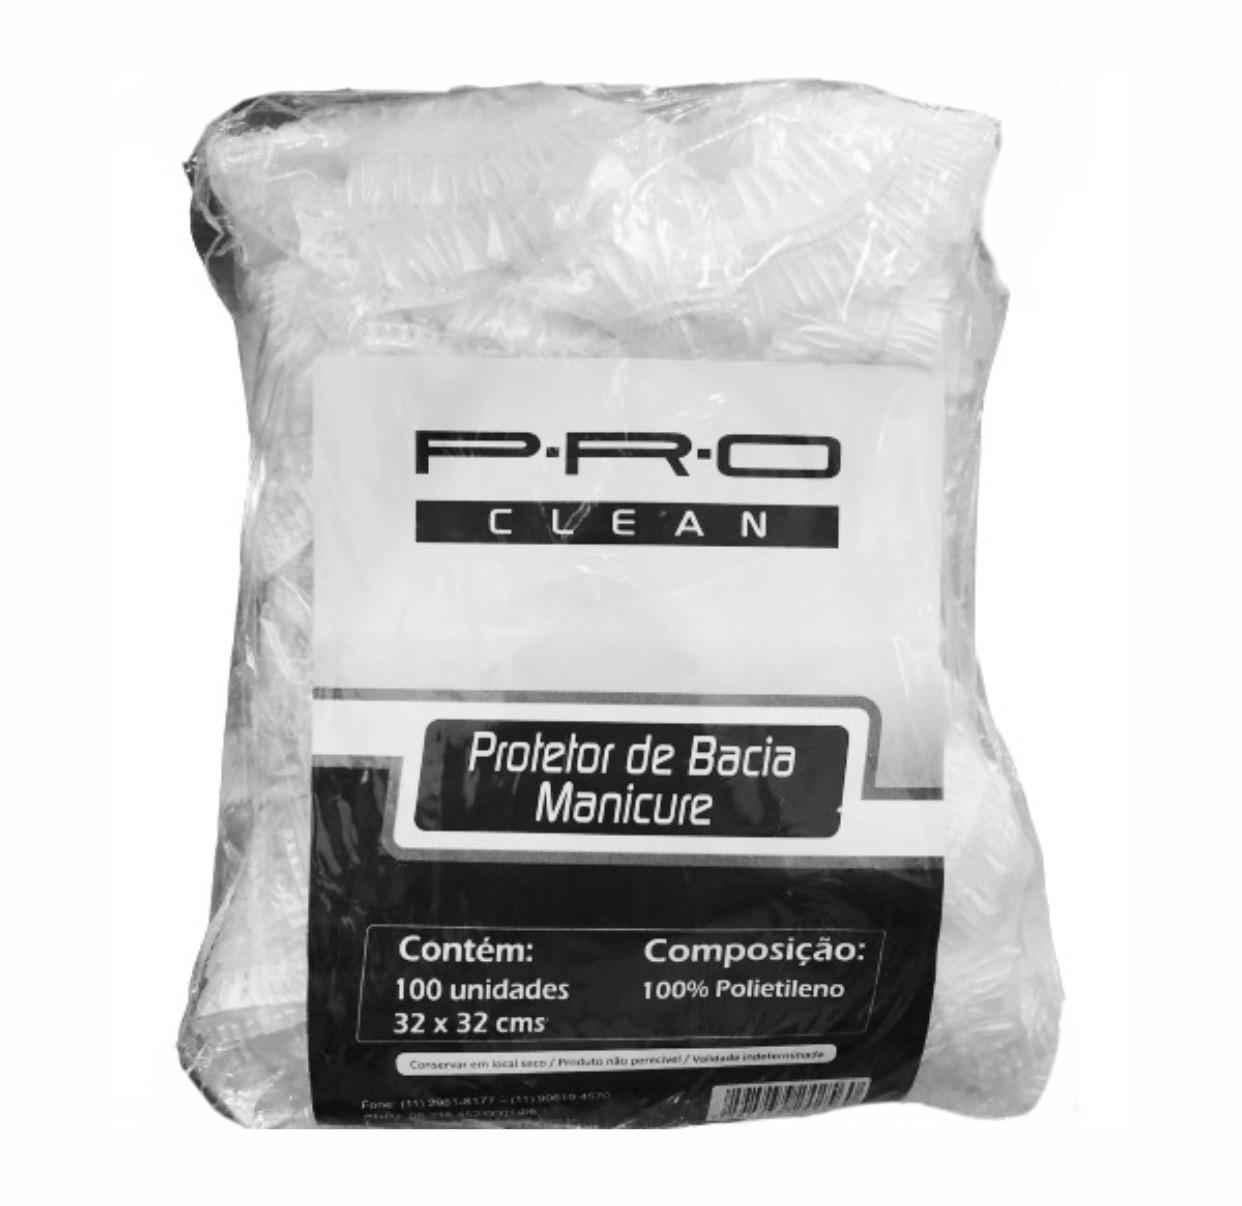 PRO Clean Protetor de Bacia Para Manicure